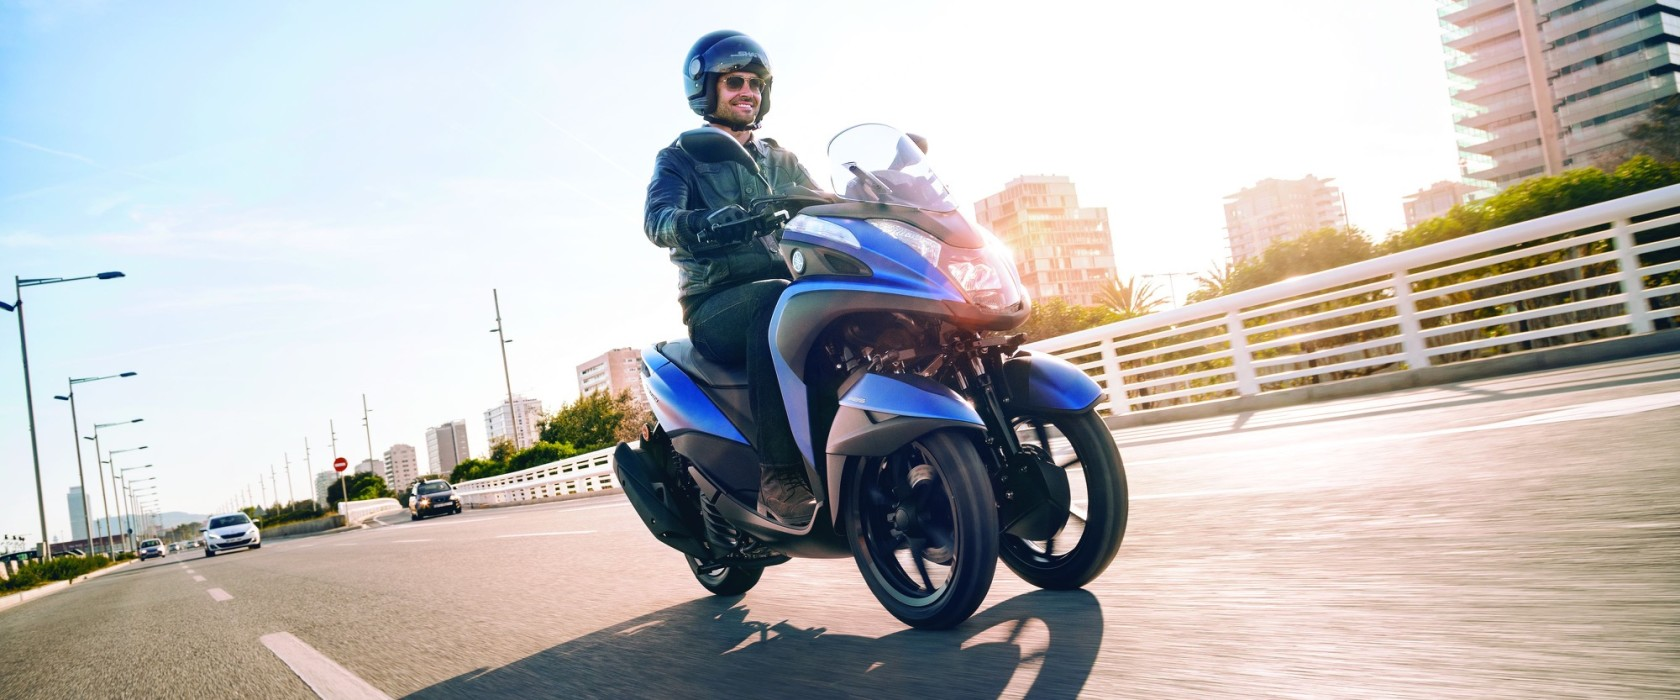 Yamaha Tricity 155 - 5